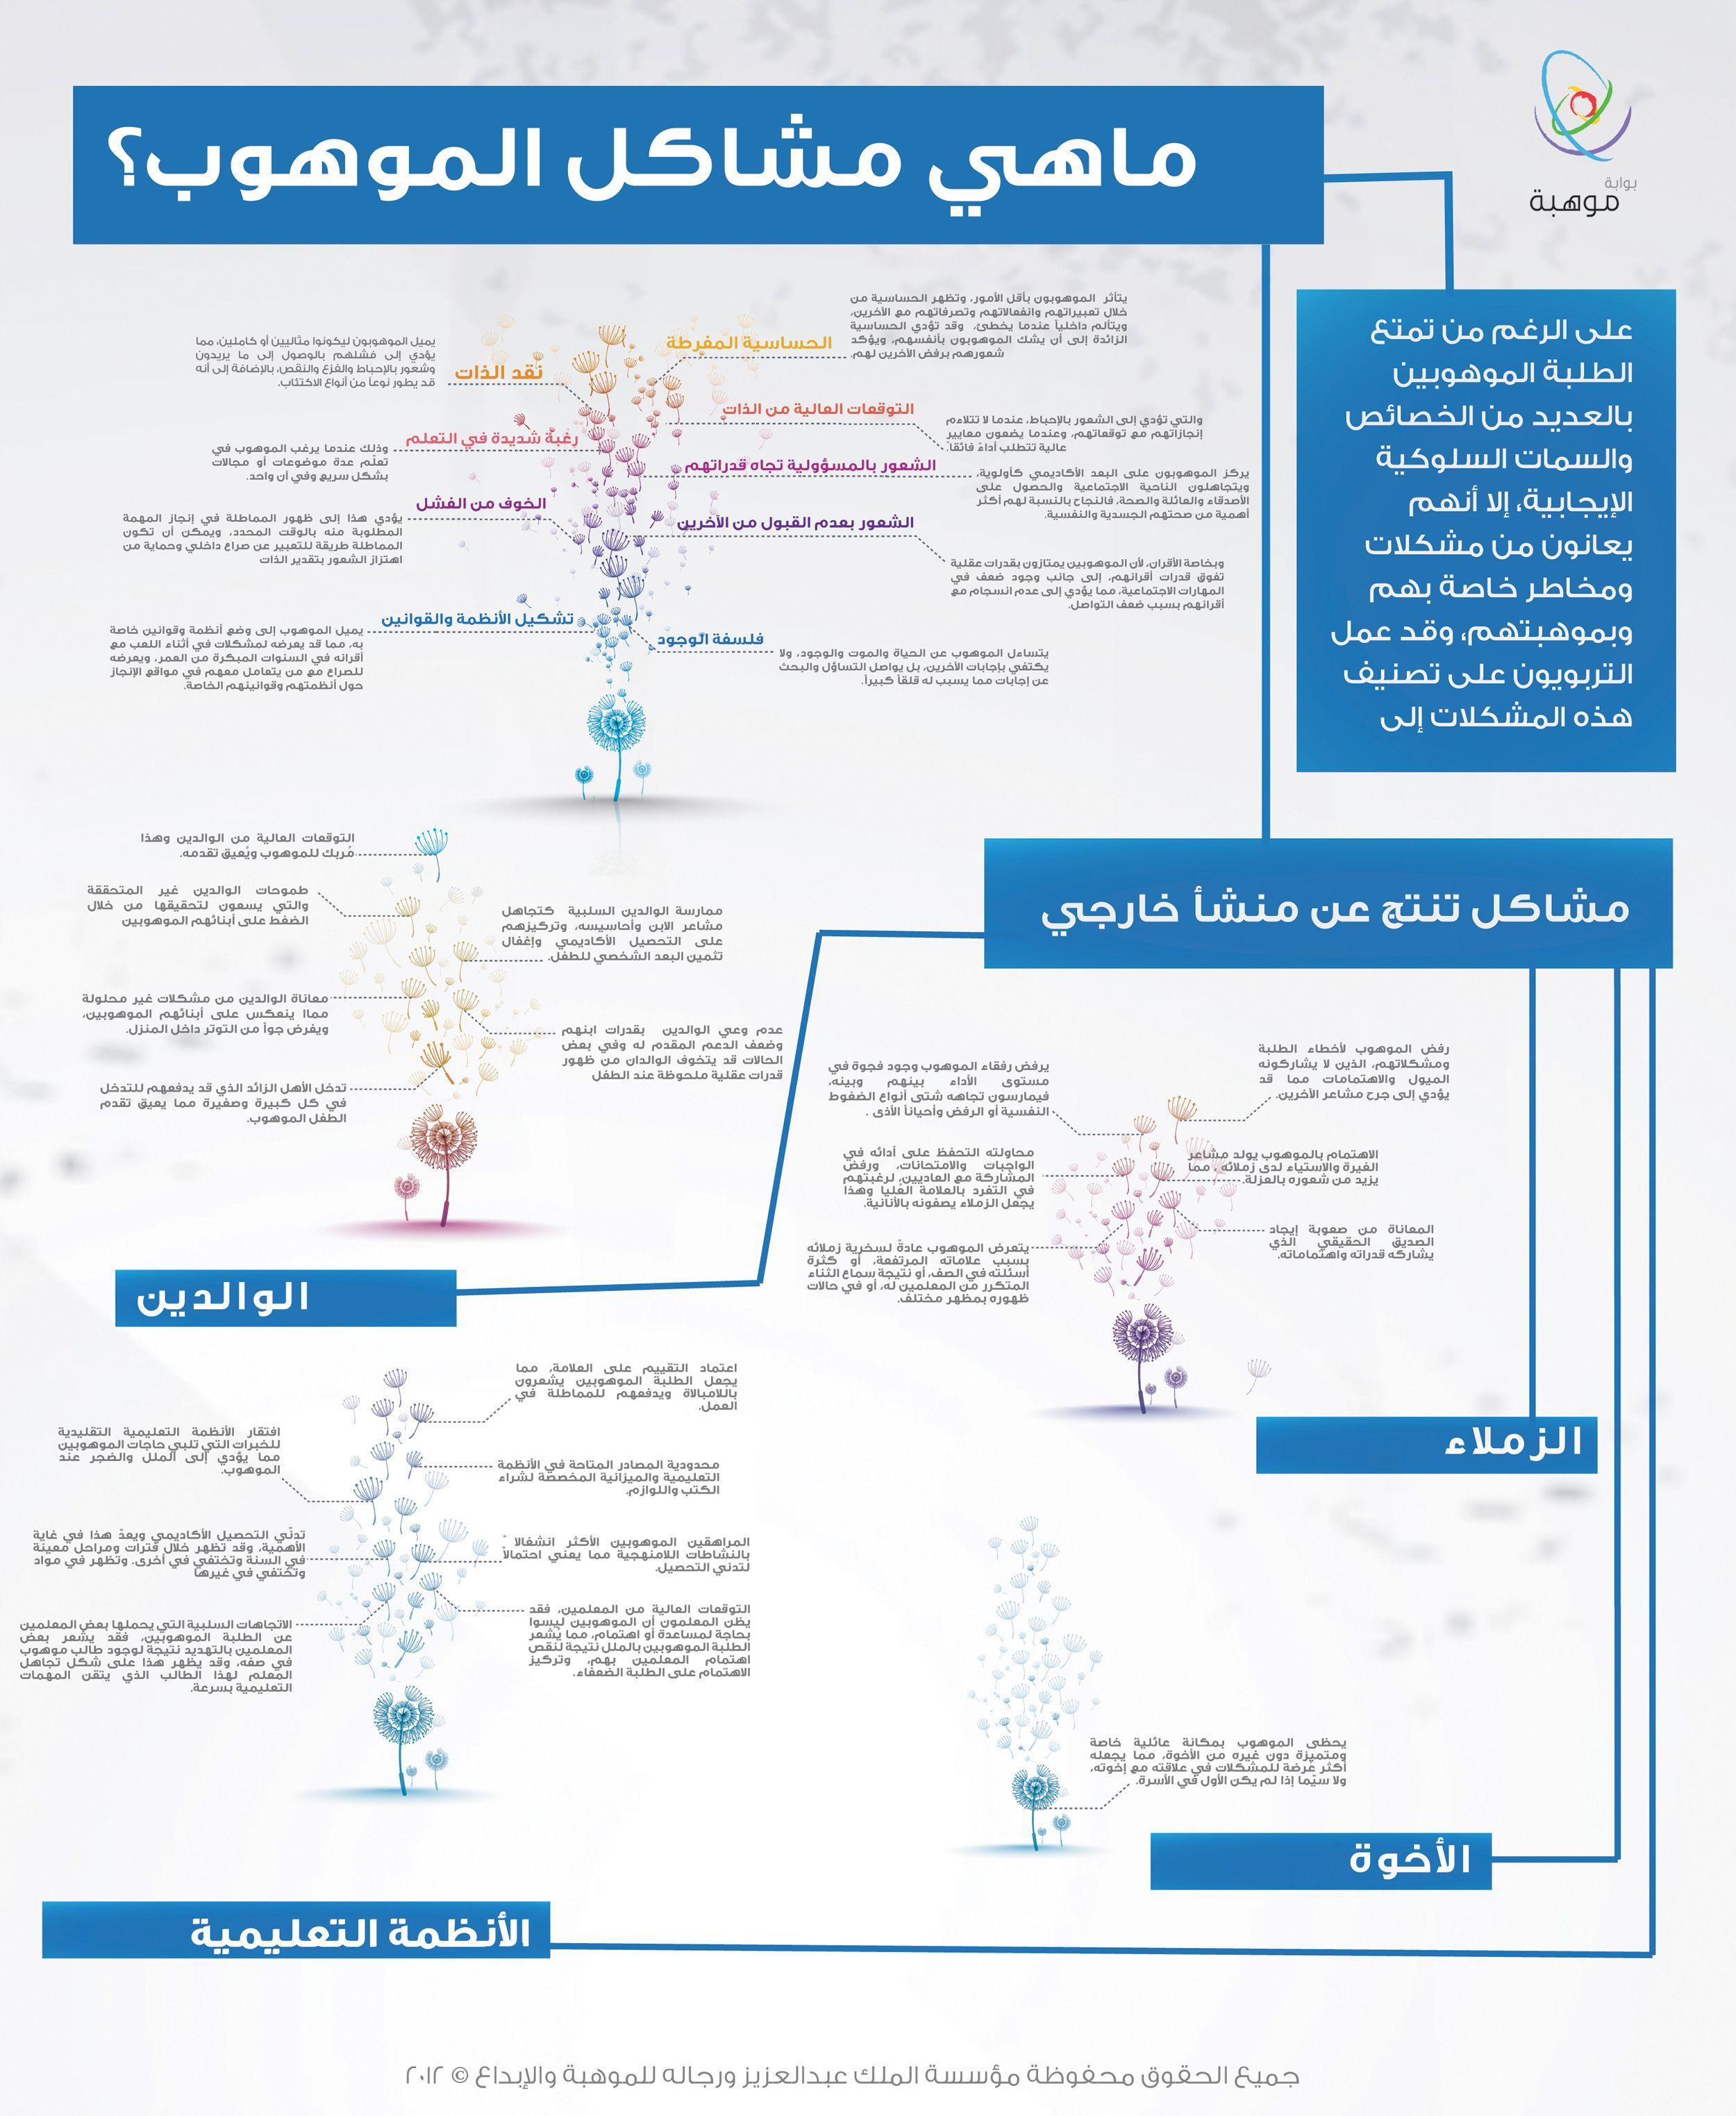 تعداد للمشاكل والمخاطر التي يتعرض لها الموهوب Http Www Mawhiba Org Infograph Pages Details Aspx Infoid 36 Giftedness Life Habits Infographic